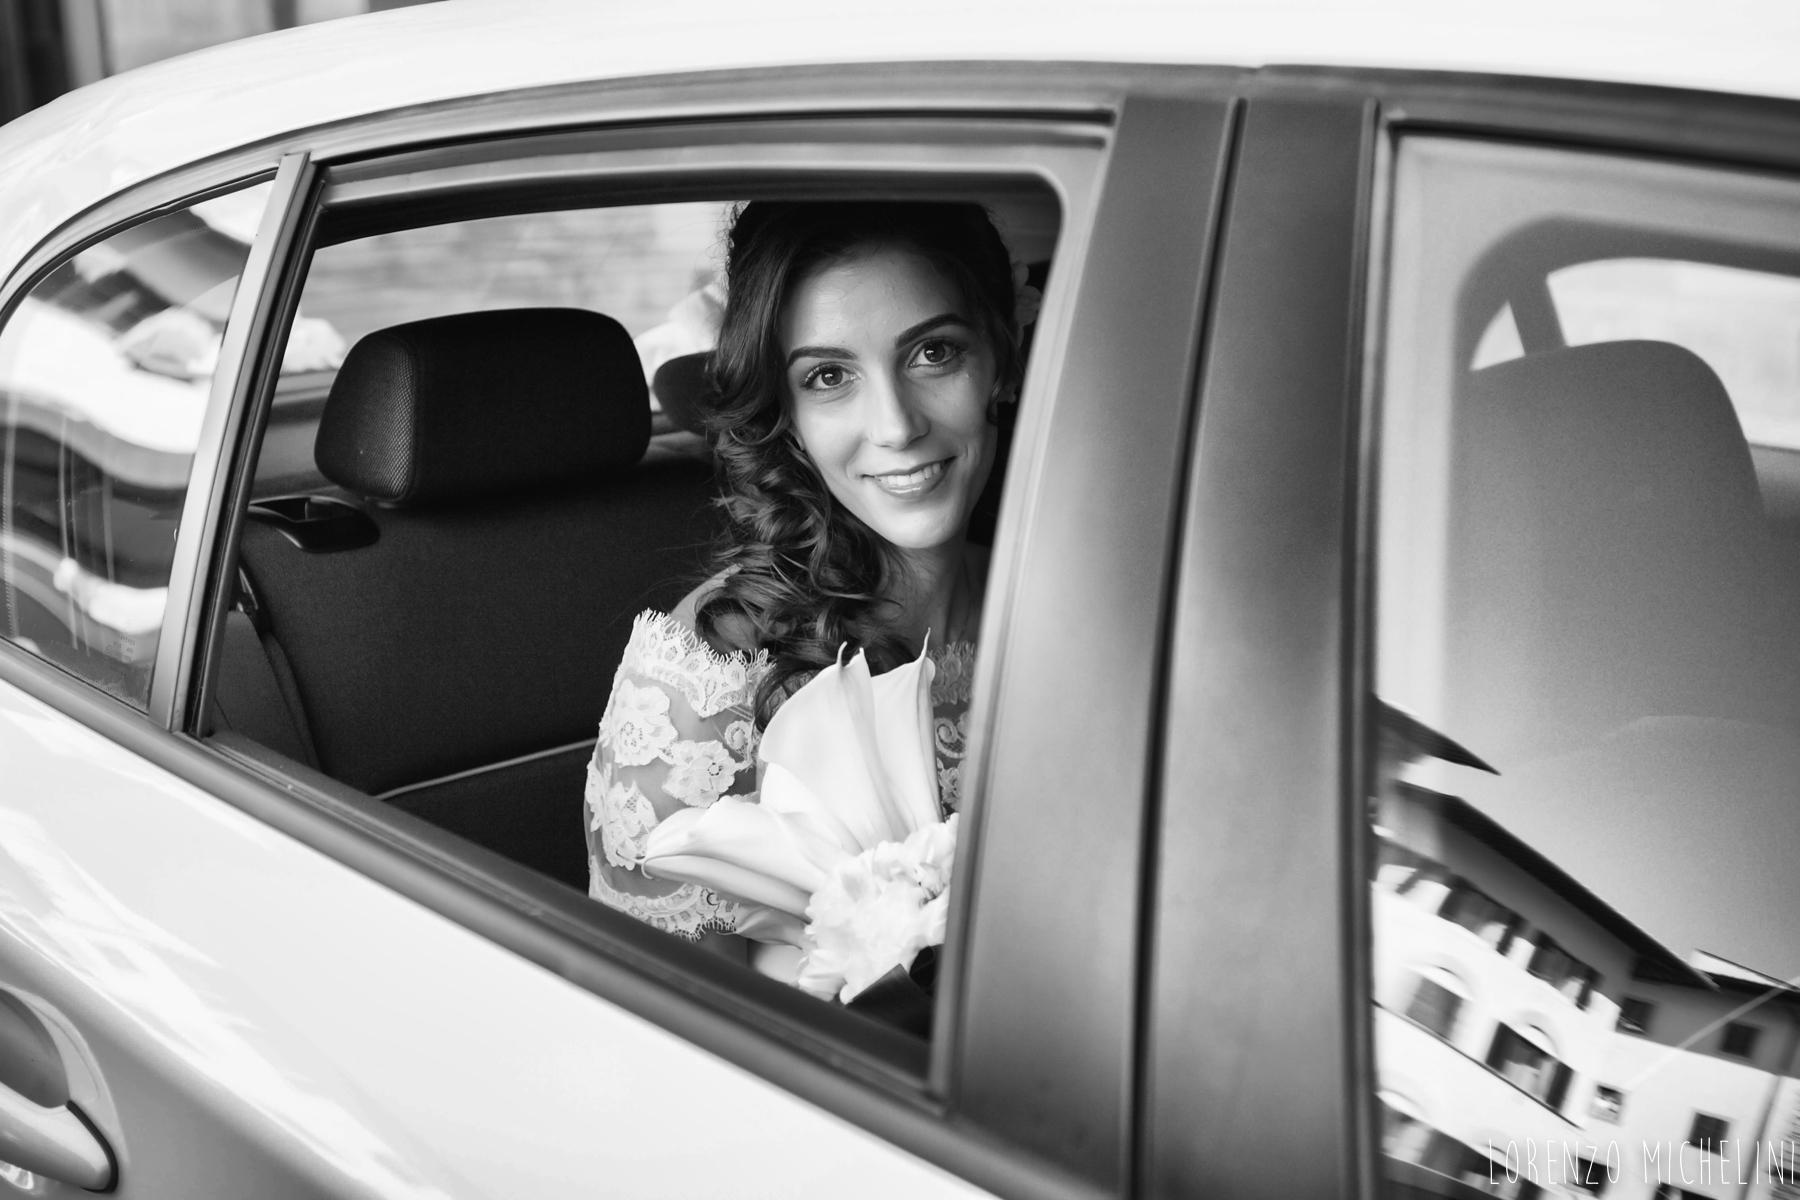 wedding-photographer-reportage-scattidamore-italy-31